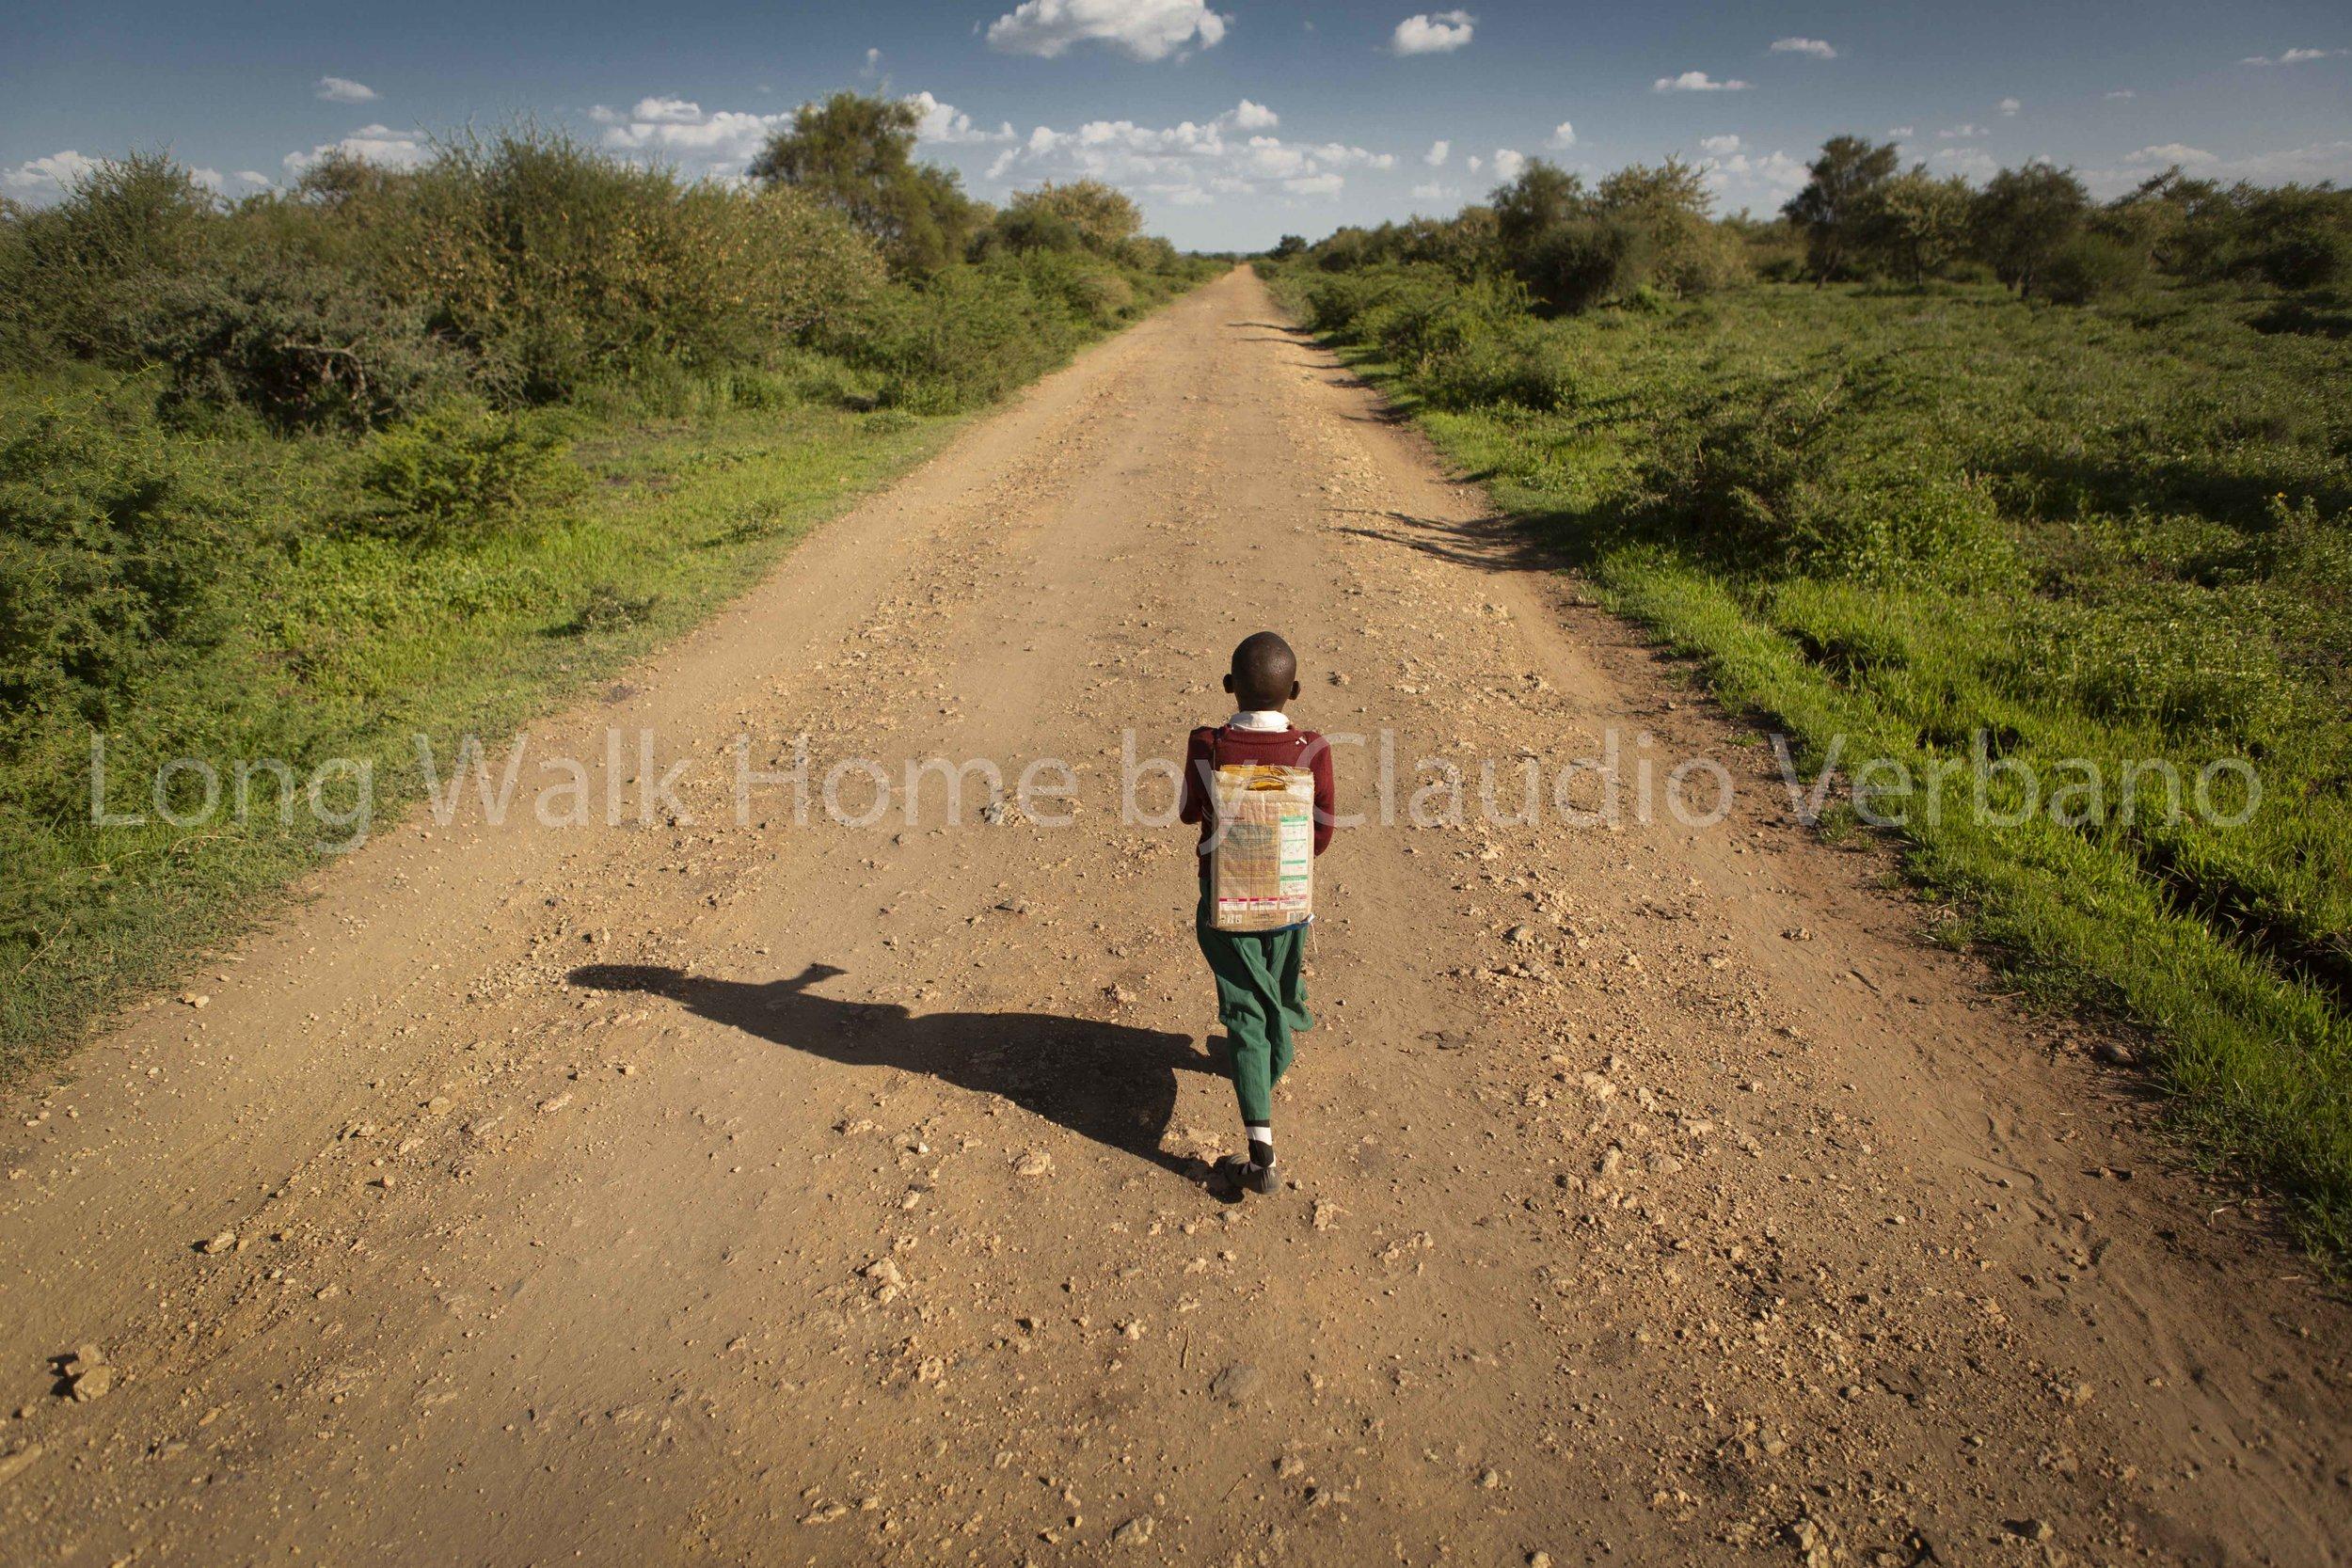 Long Walk Home -